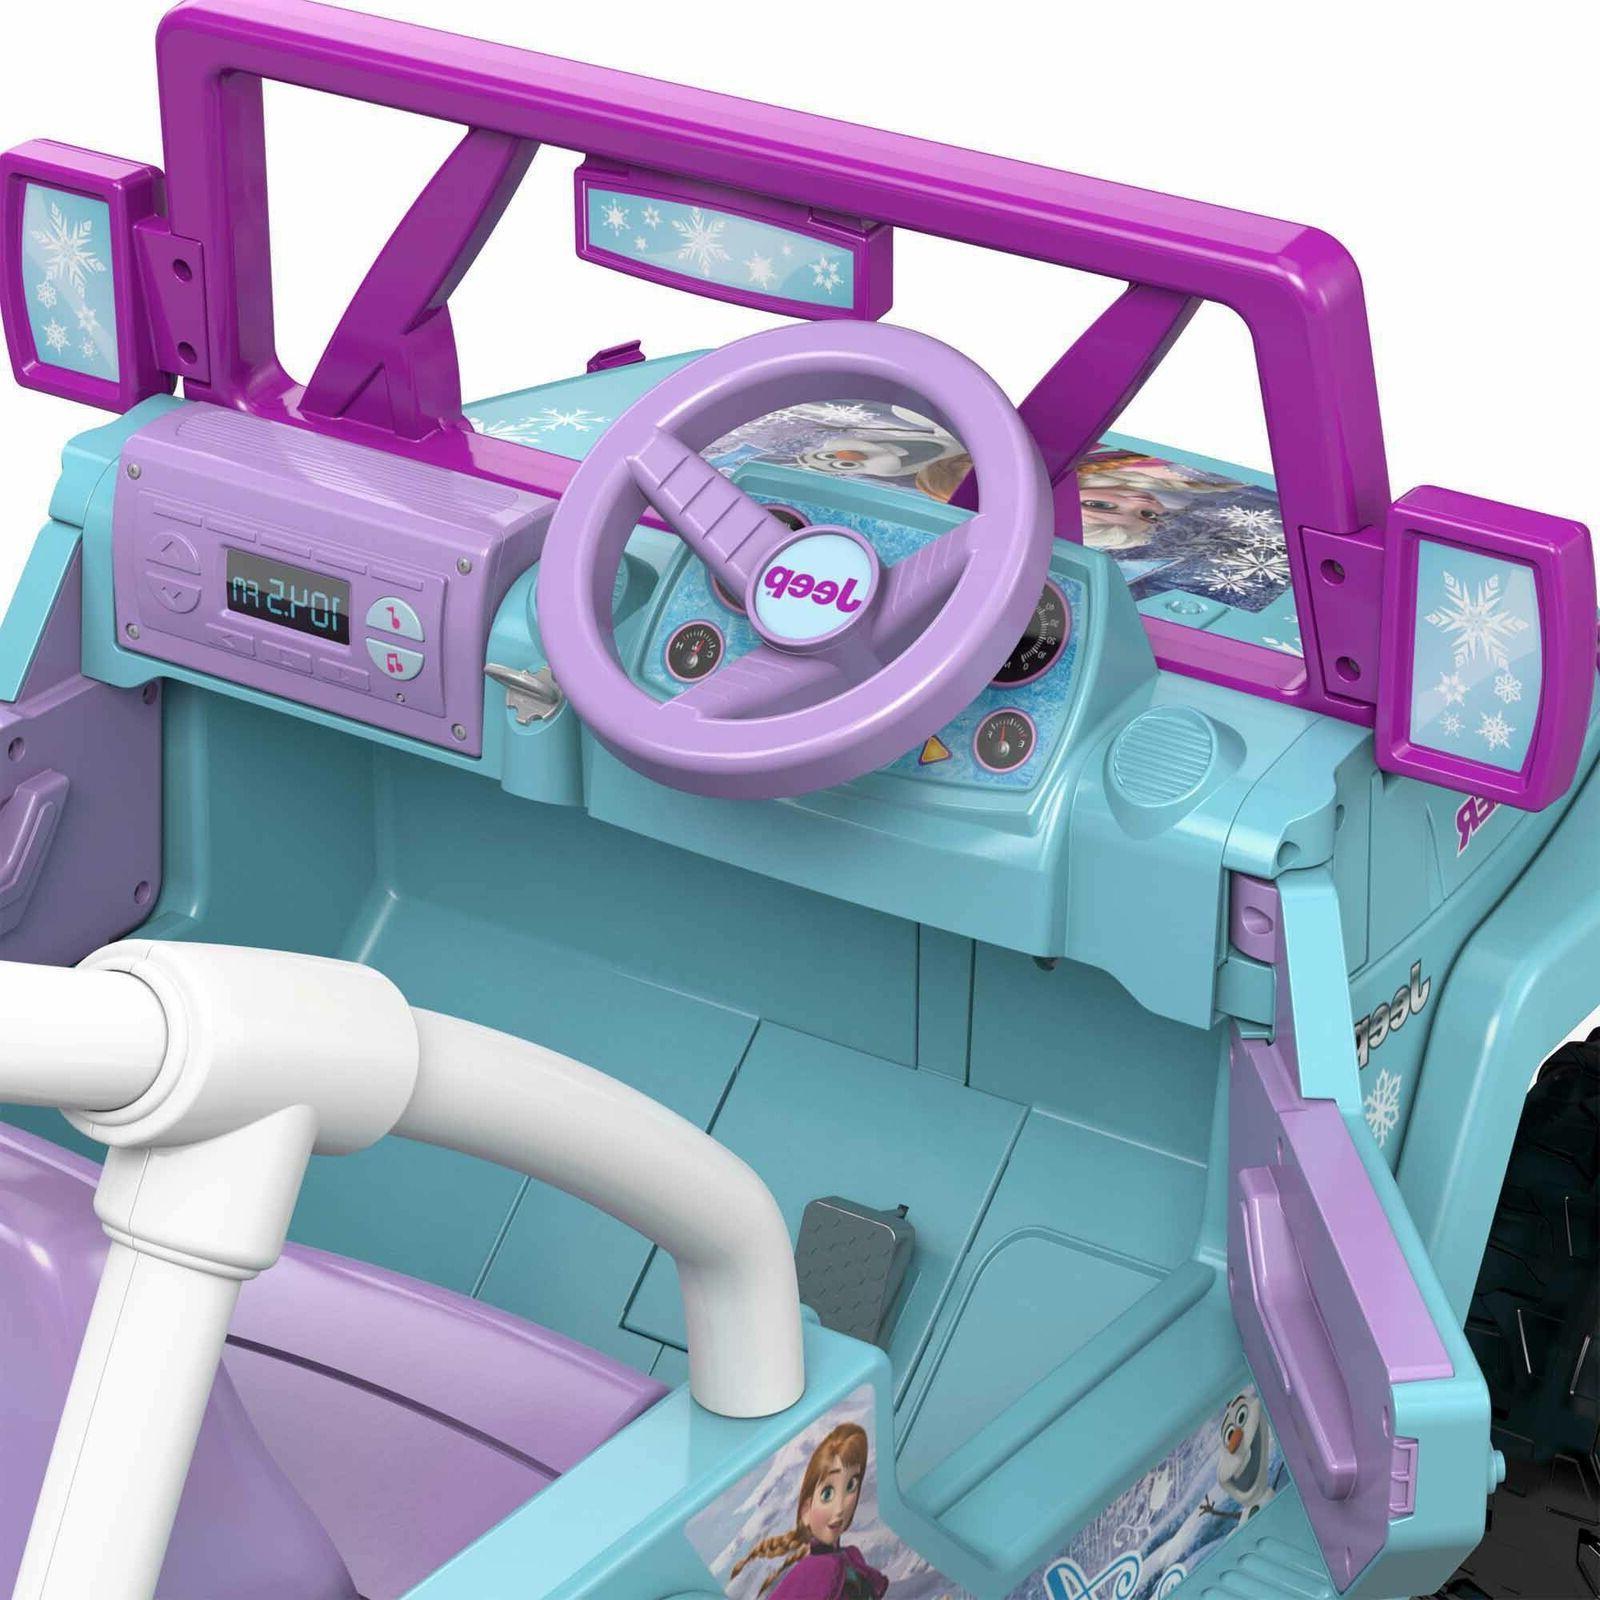 Power Frozen 12-V Ride